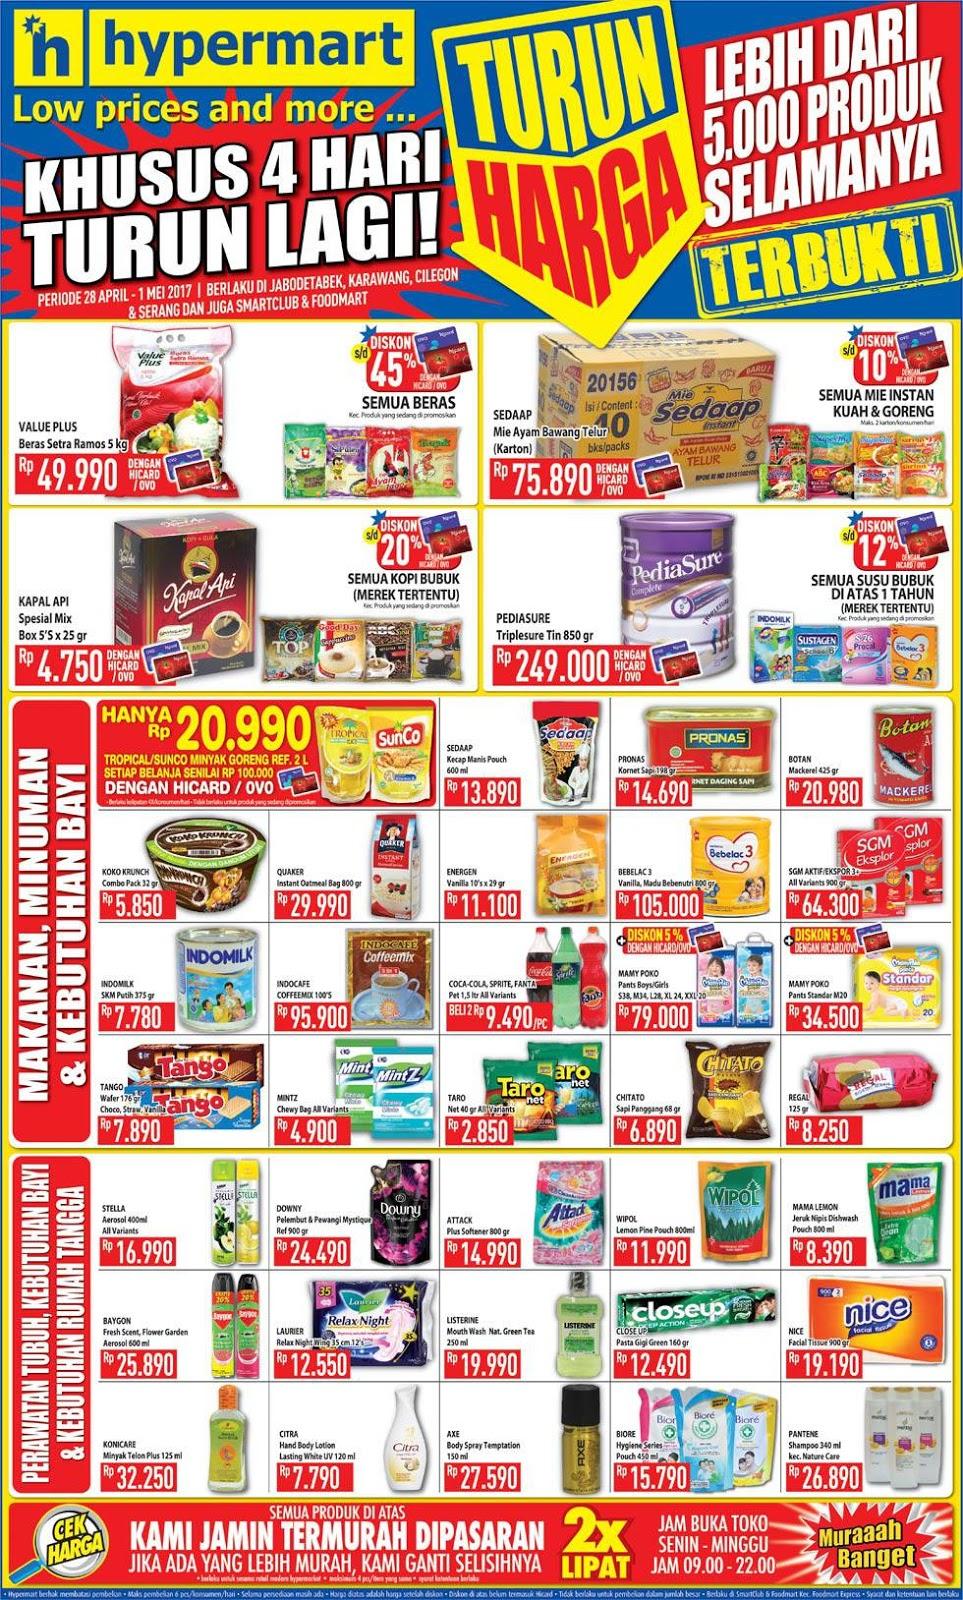 14 New Download Promo Hypermart 2 Mei 2019 Free Voucher Belanja Koran 2017 April 30 28